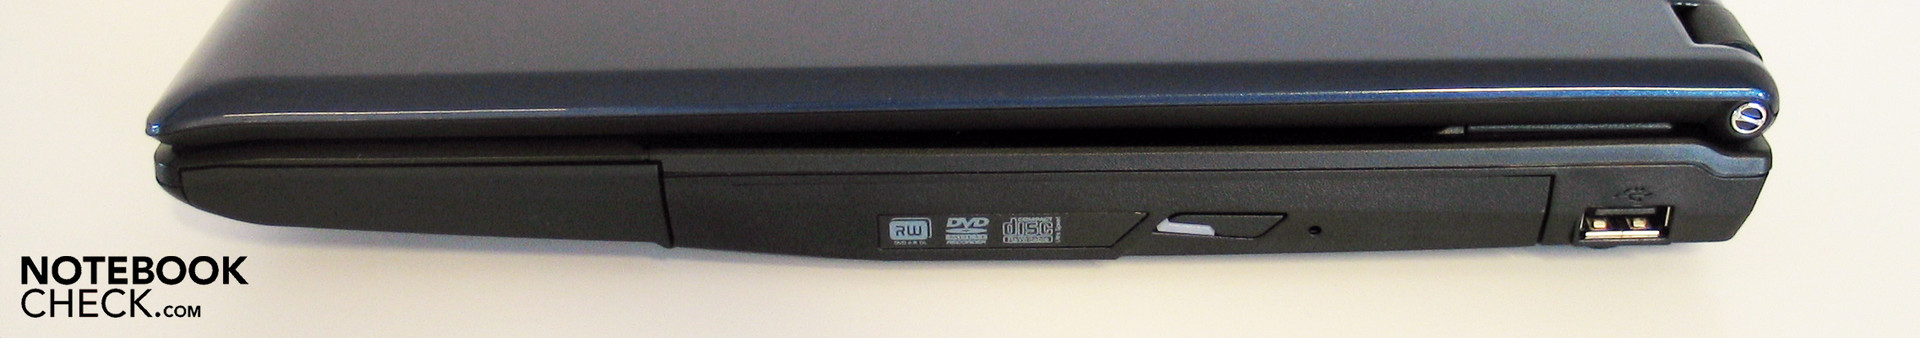 MSI GX400 LAN DRIVERS FOR WINDOWS VISTA